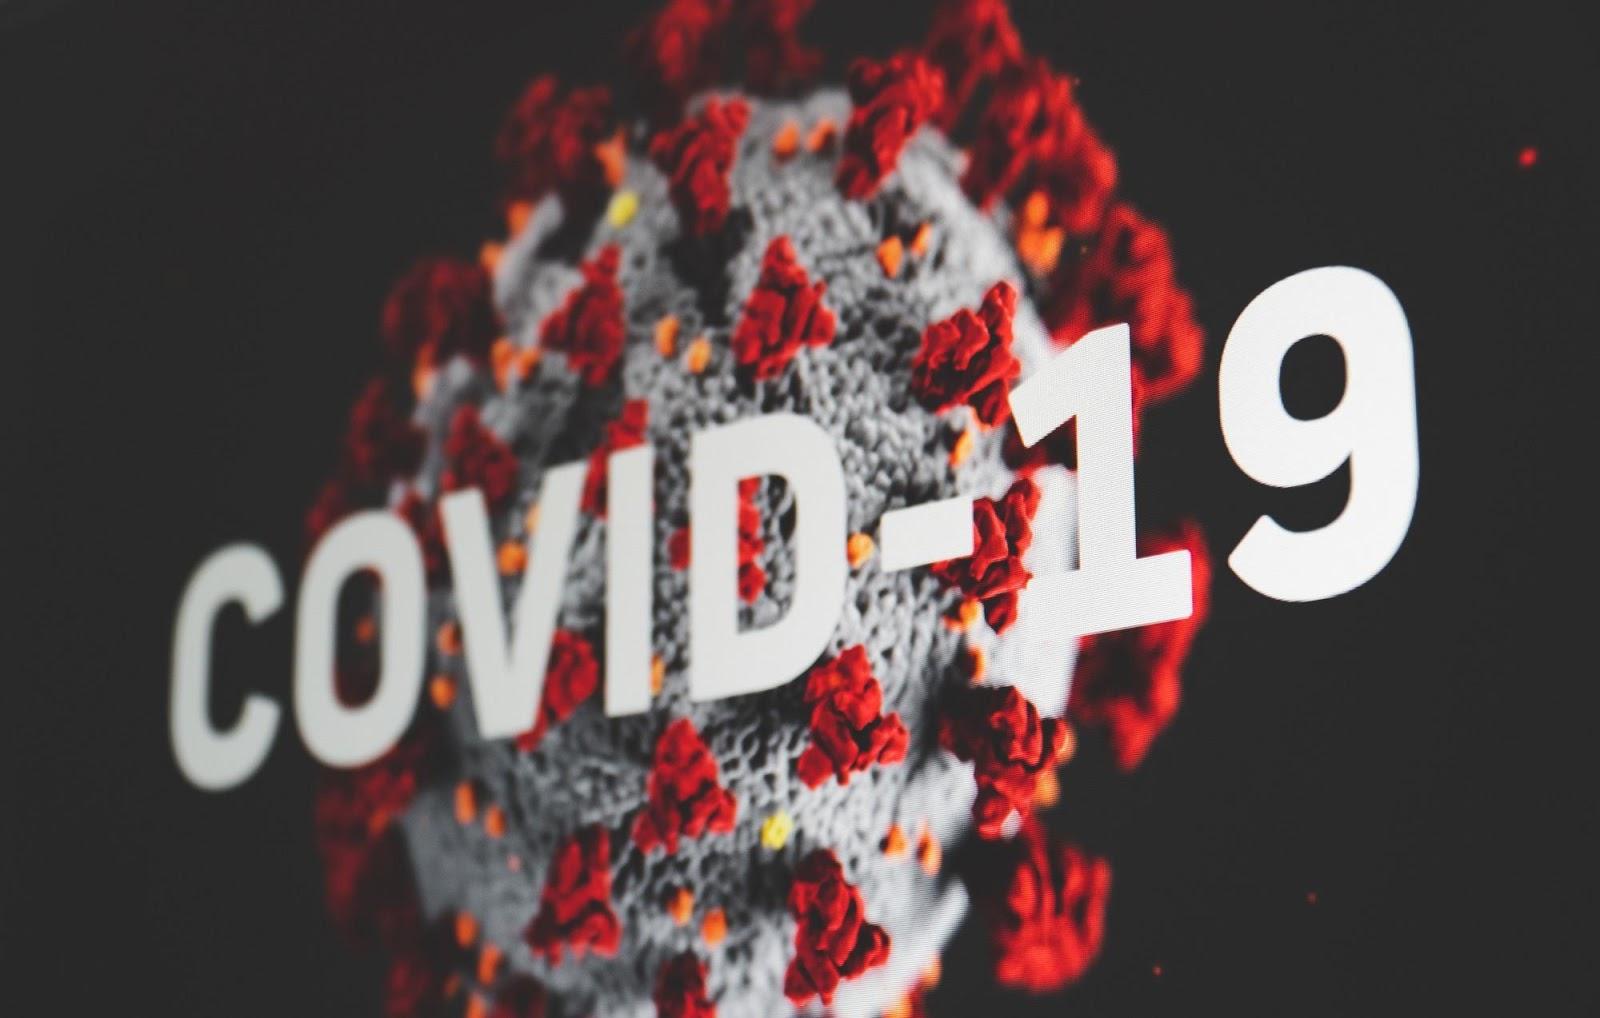 Daño que el coronavirus causa al mercado global diariamente 2